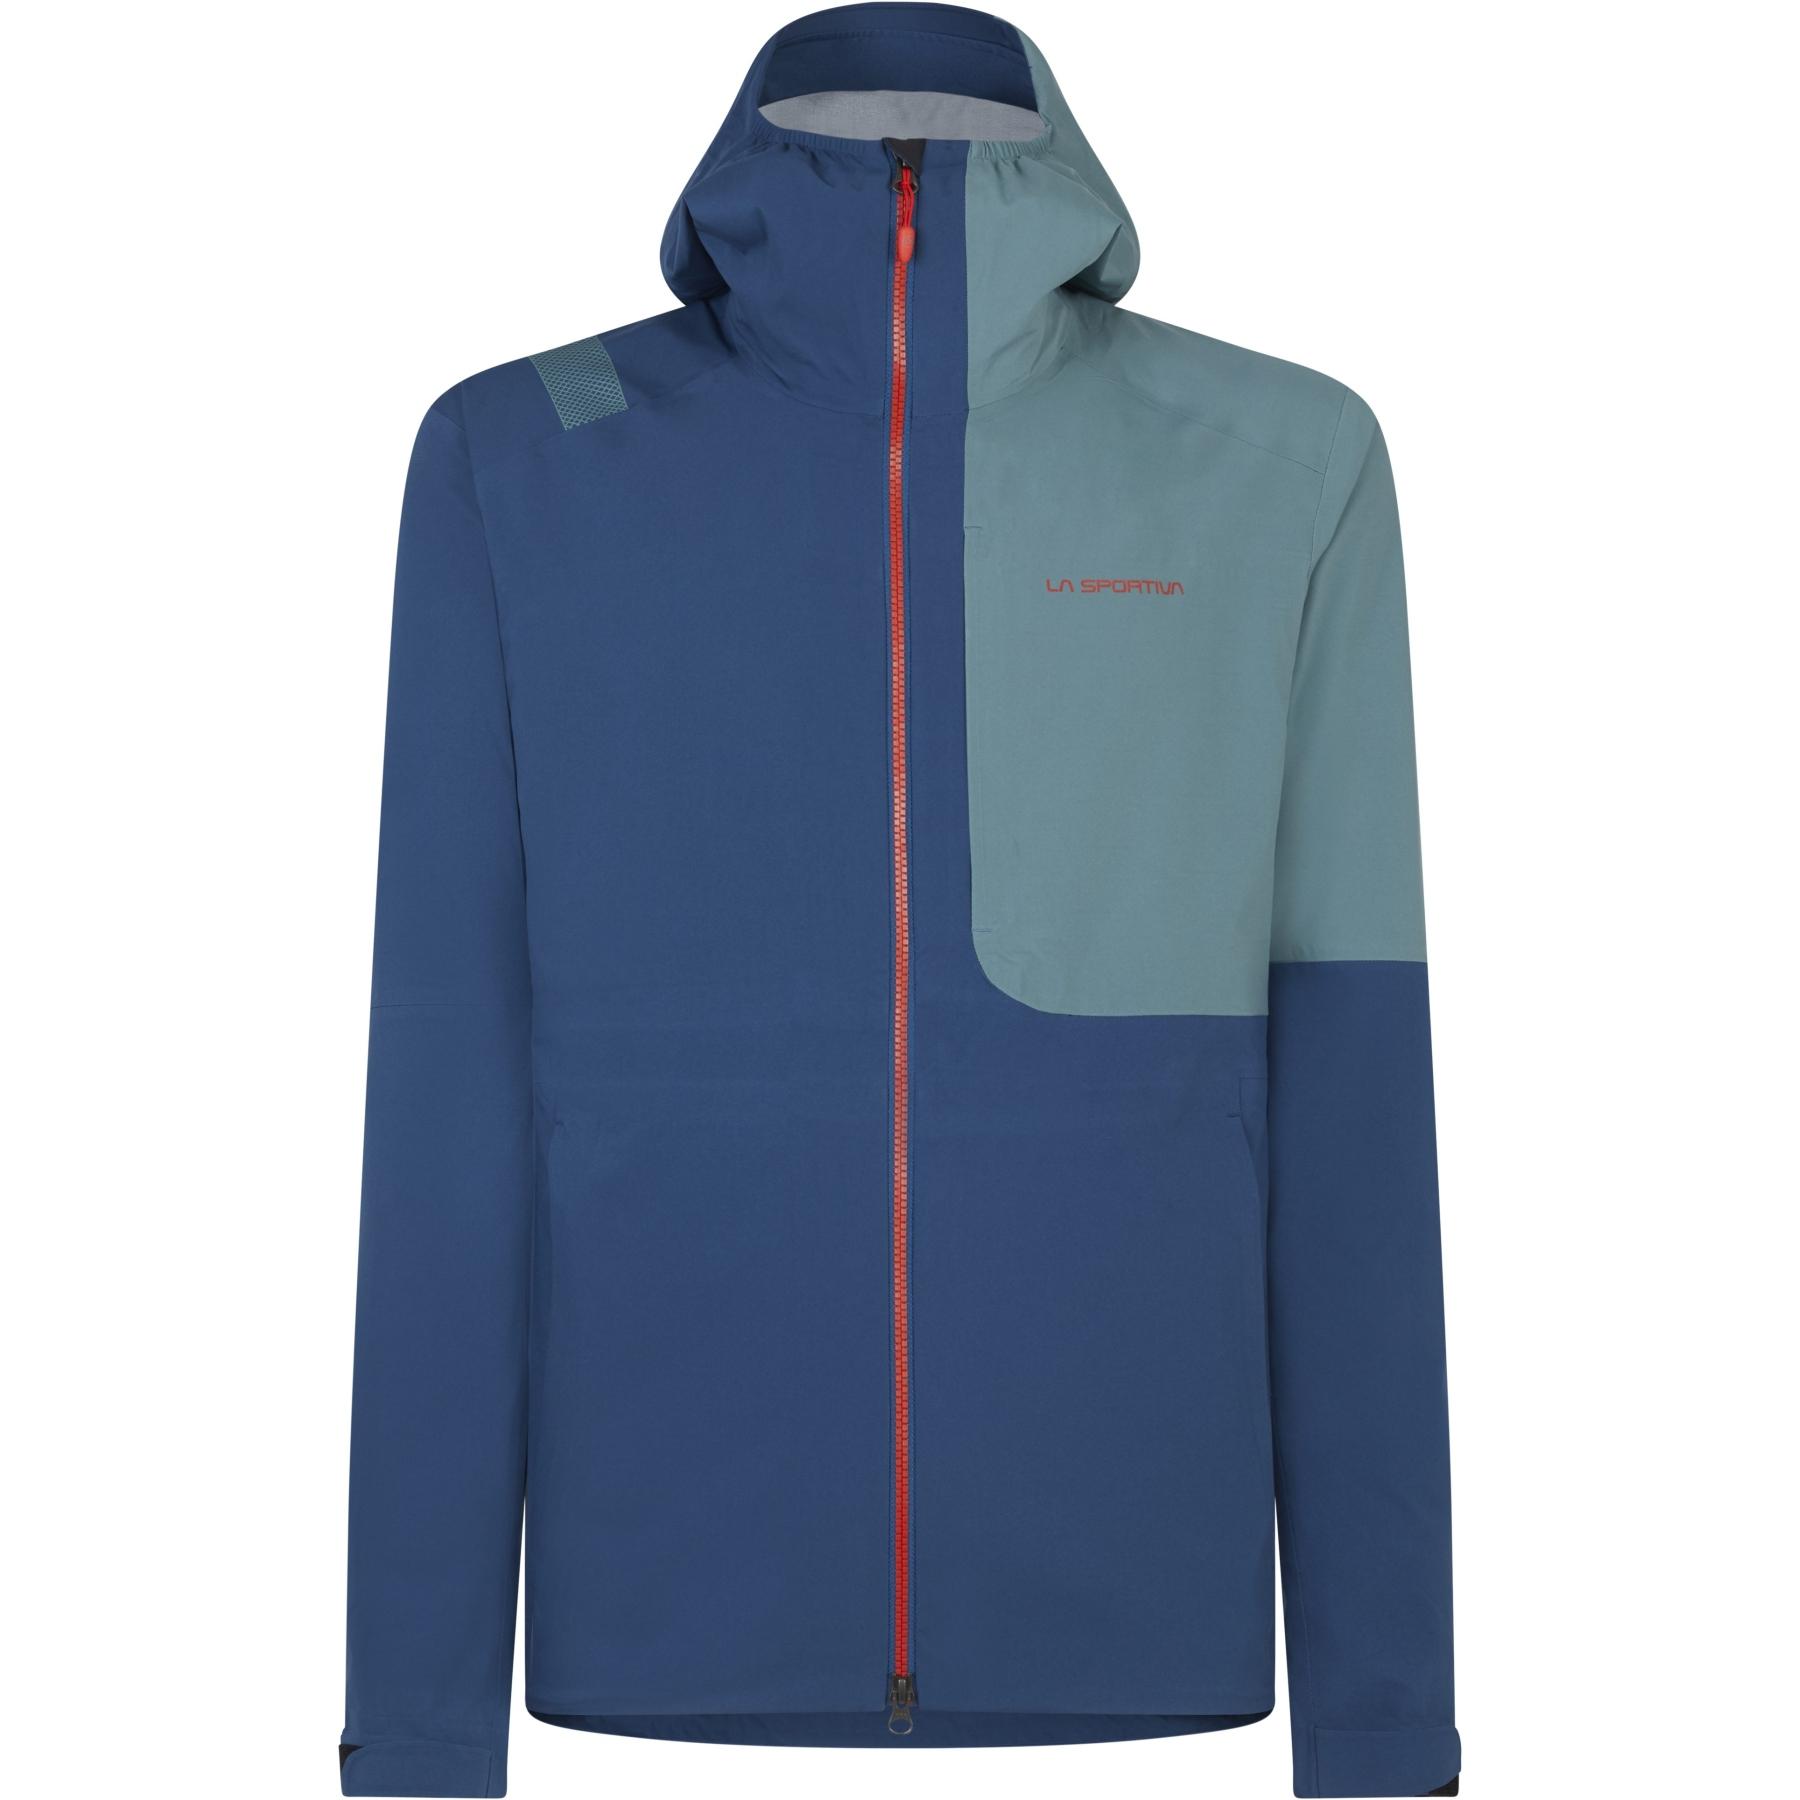 La Sportiva Crizzle Jacket - Opal/Pine